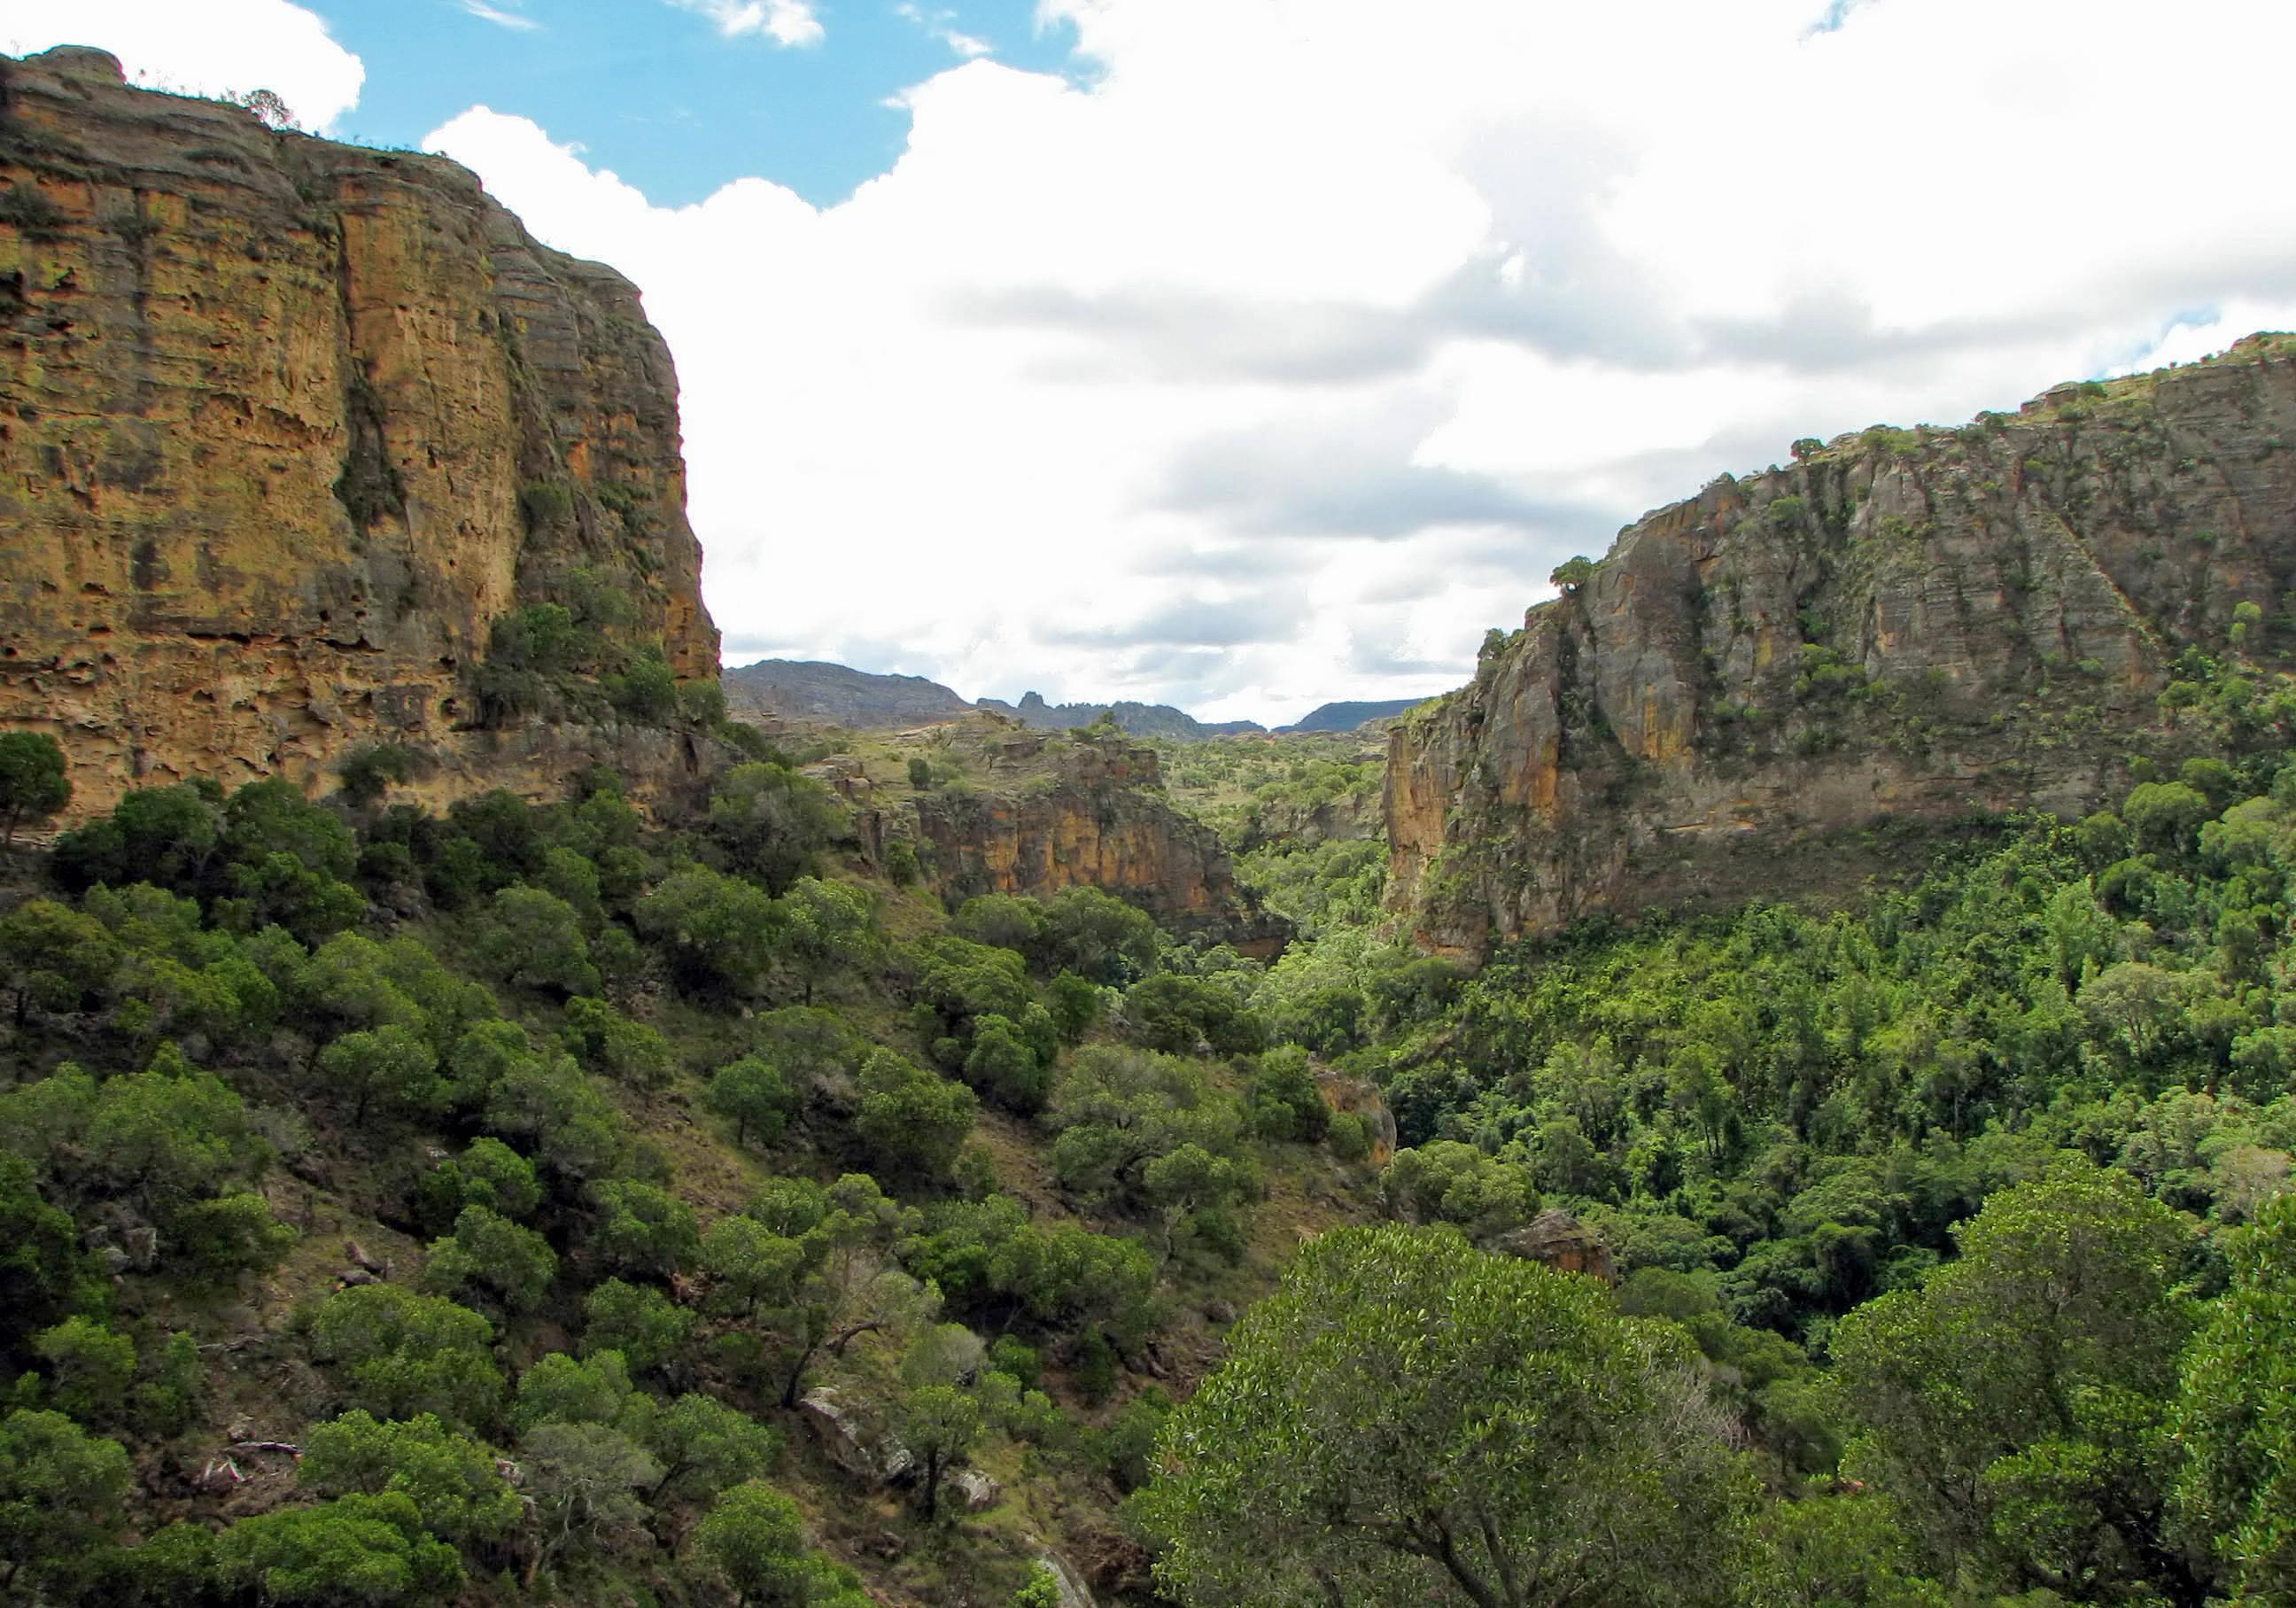 File:Isalo National Park 06.jpg - Wikimedia Commons